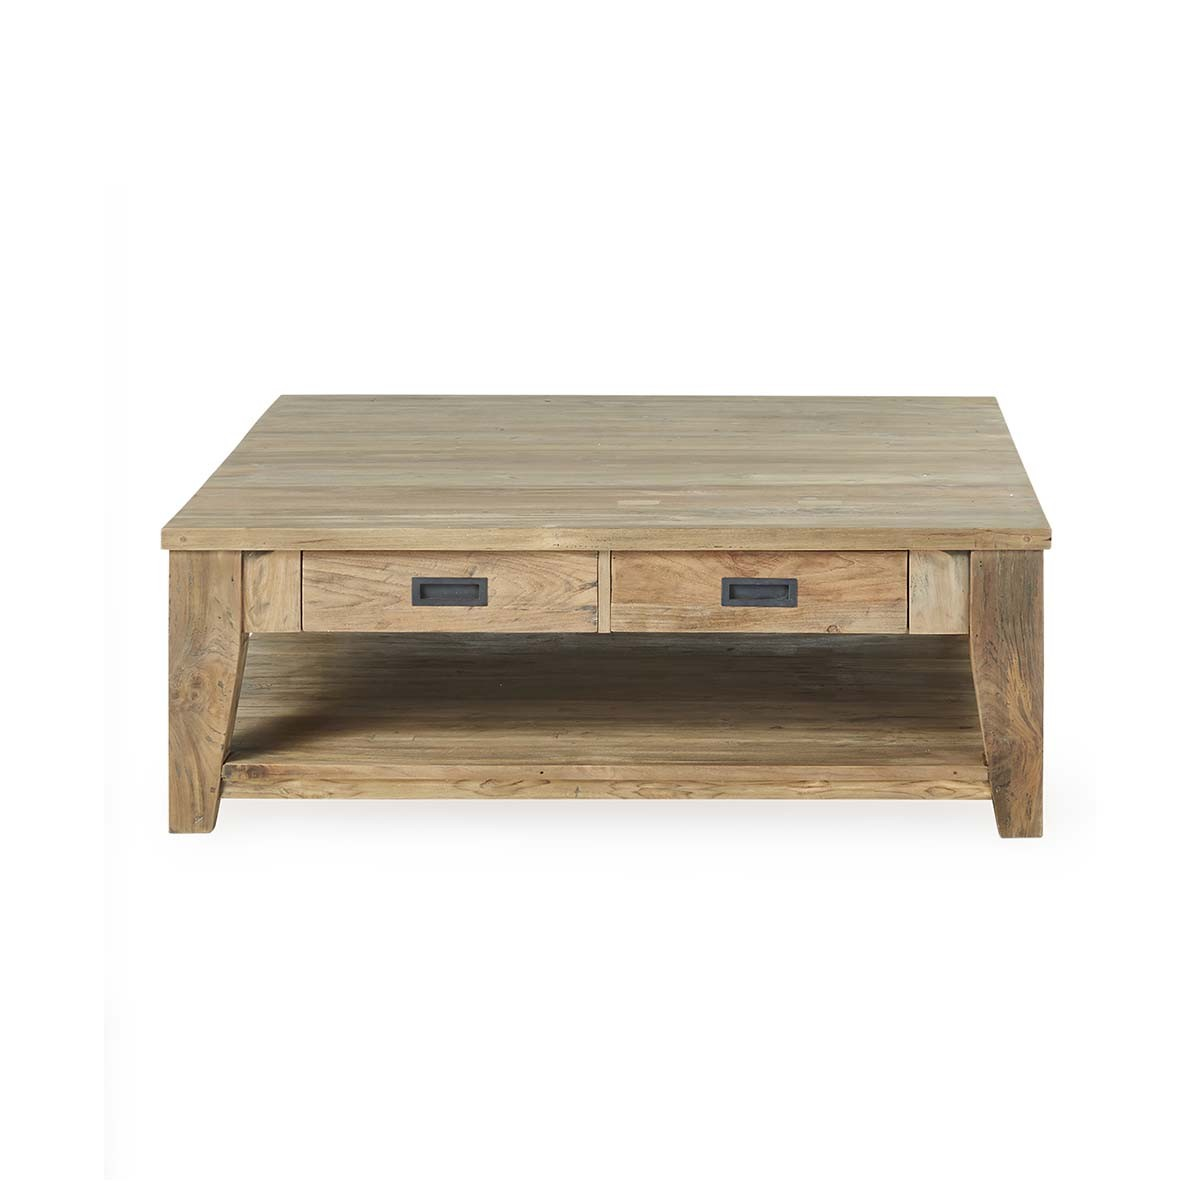 Table basse 2 tiroirs en teck recyclé